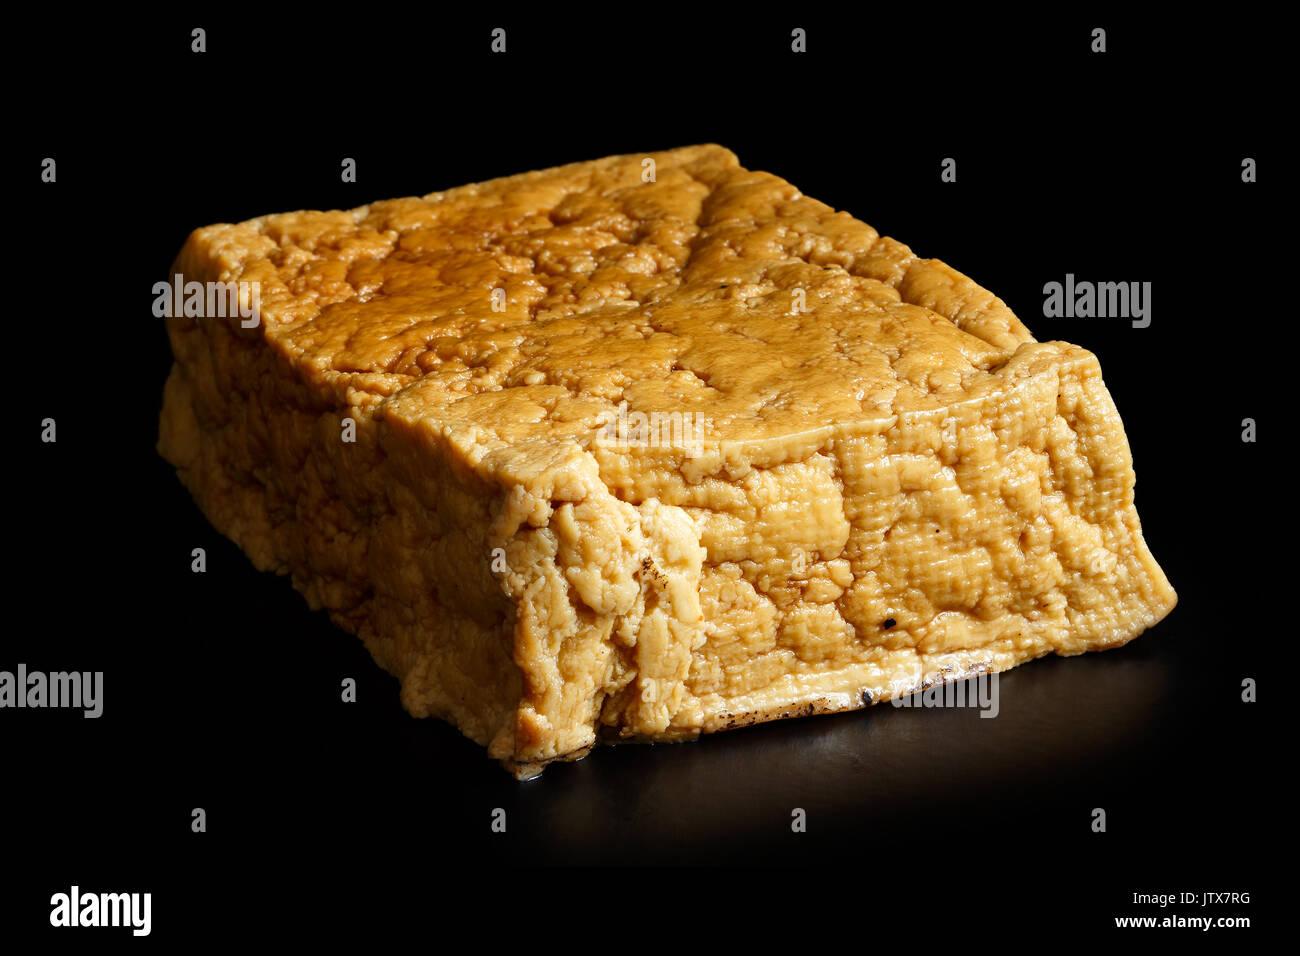 Single block of smoked tofu isolated on black. - Stock Image